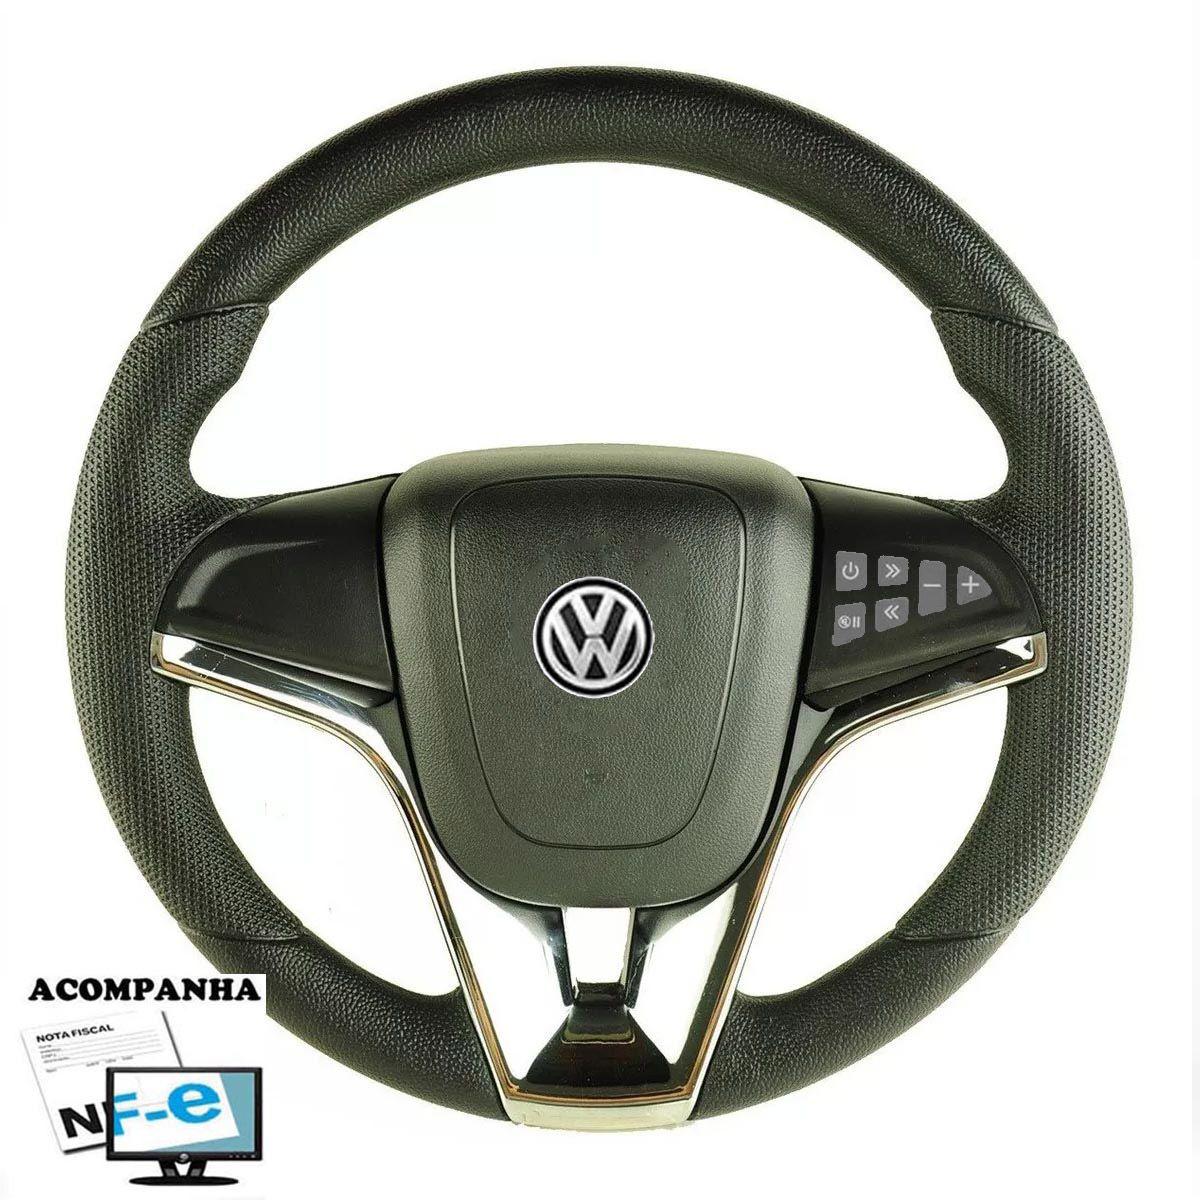 Volante Multifuncional Volkswagen Cruze Pelicula Esportivo Cubo Gol Quadrado G2 G3 G4 G5 1980 a 2013 Poliparts